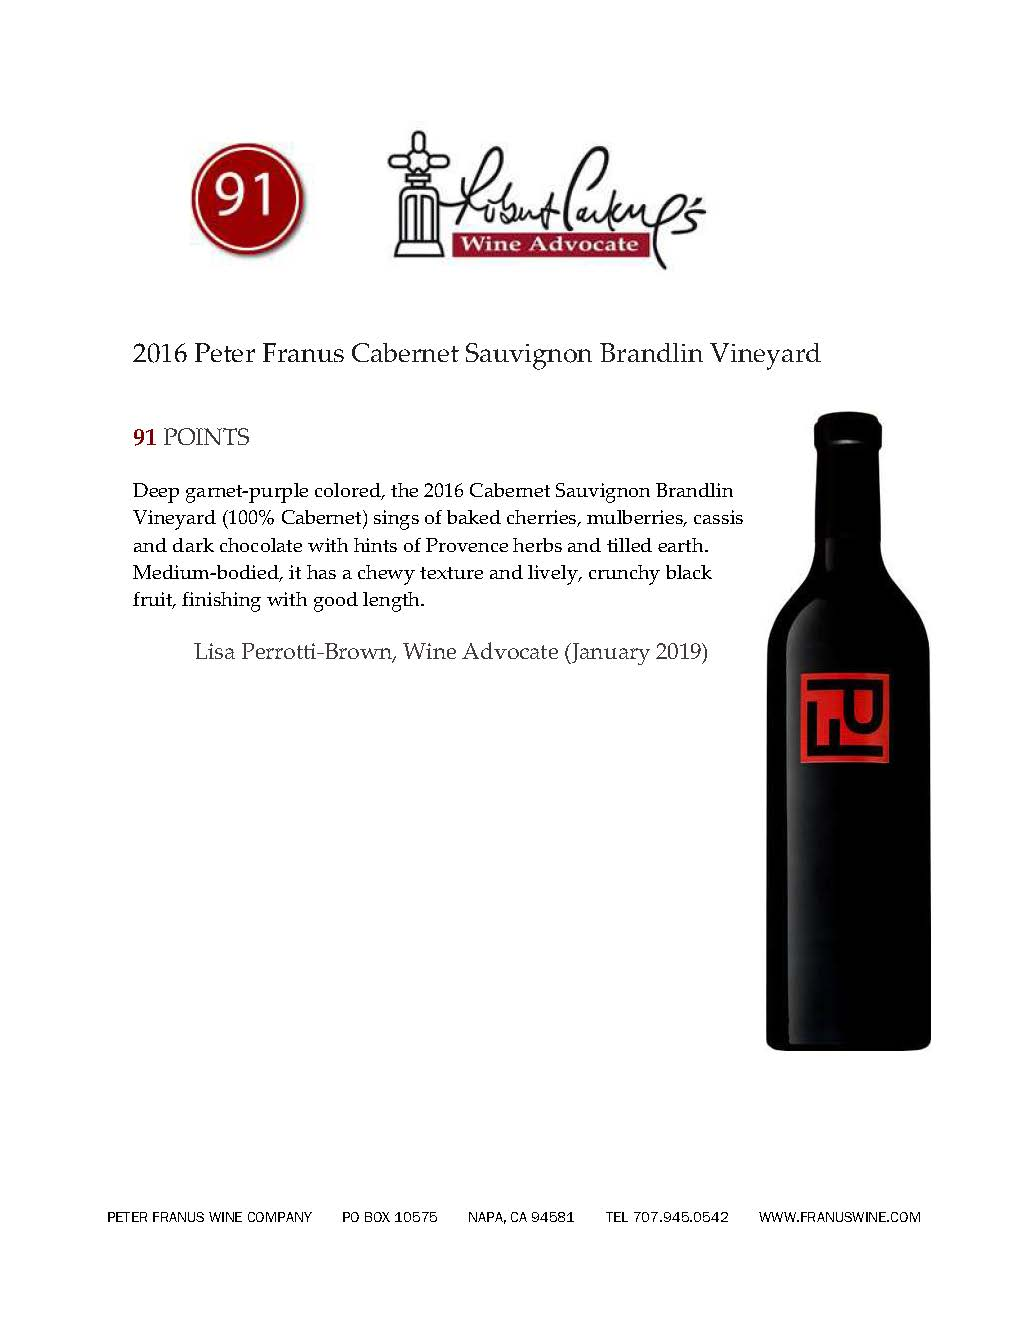 https://www.angeliniwine.com/wp-content/uploads/2019/10/2016_PF_Brandlin_Cabernet_Sauvignon_wine-advocate.jpg